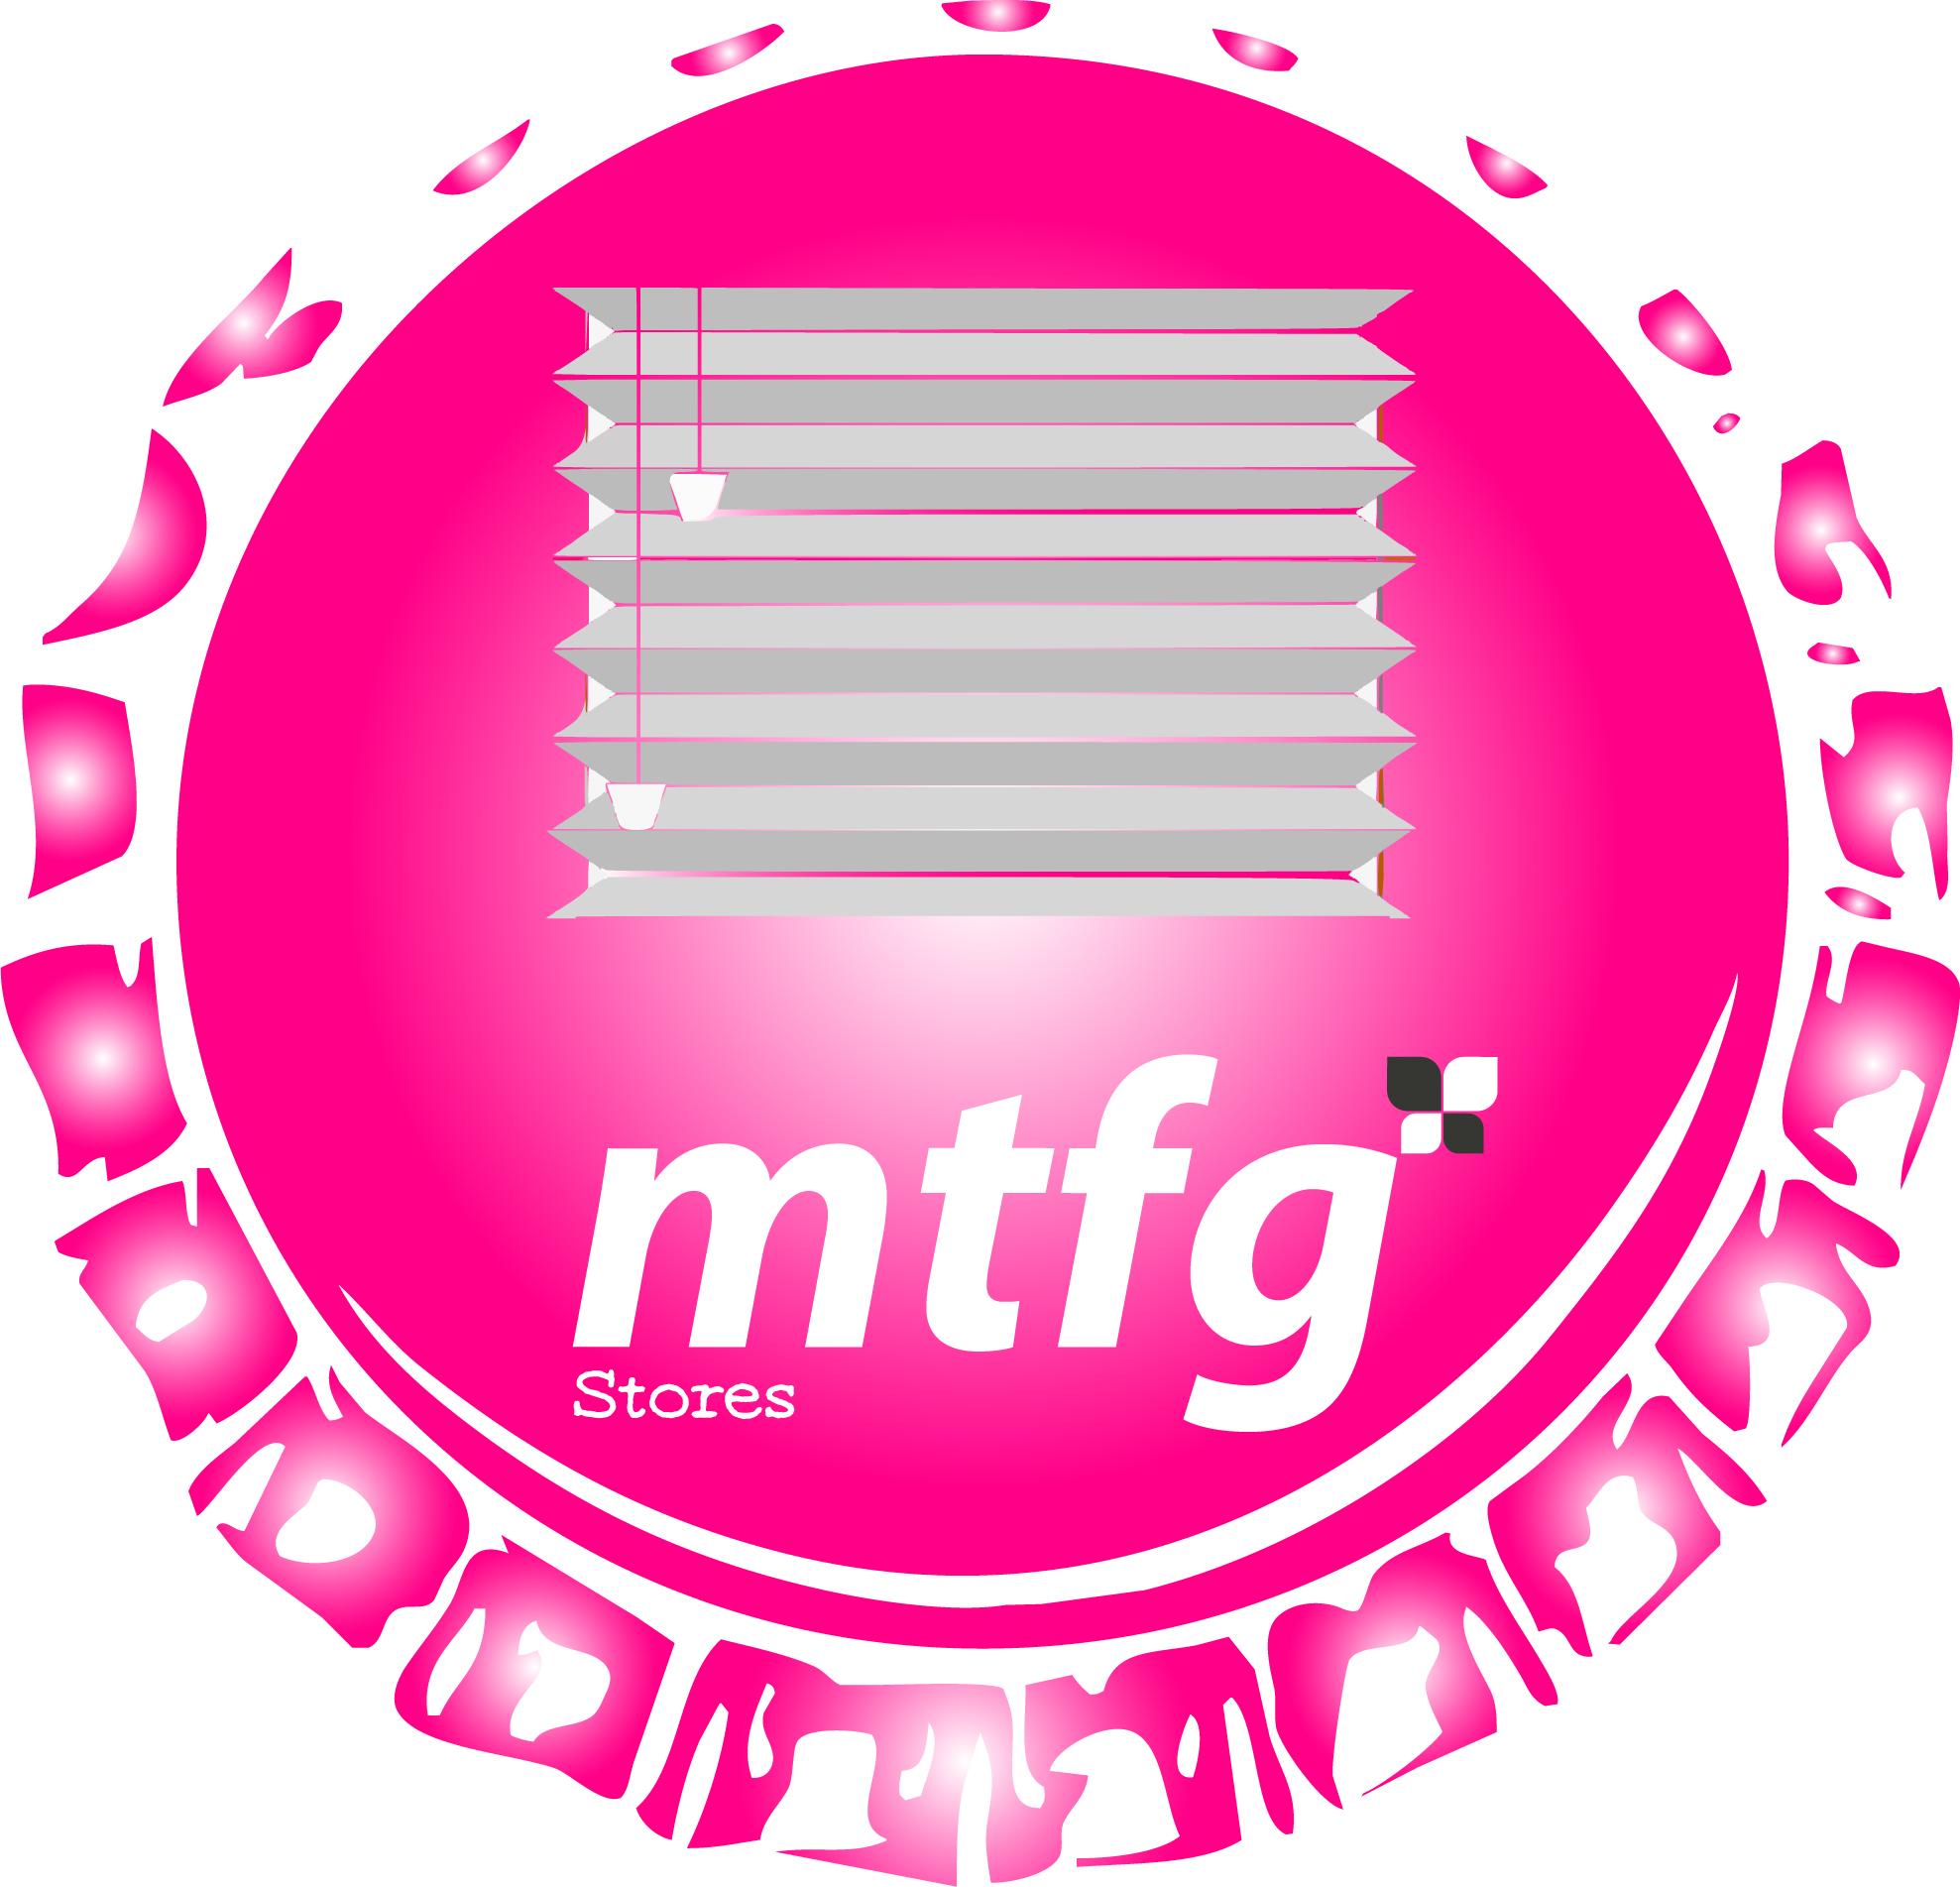 MTFG stores